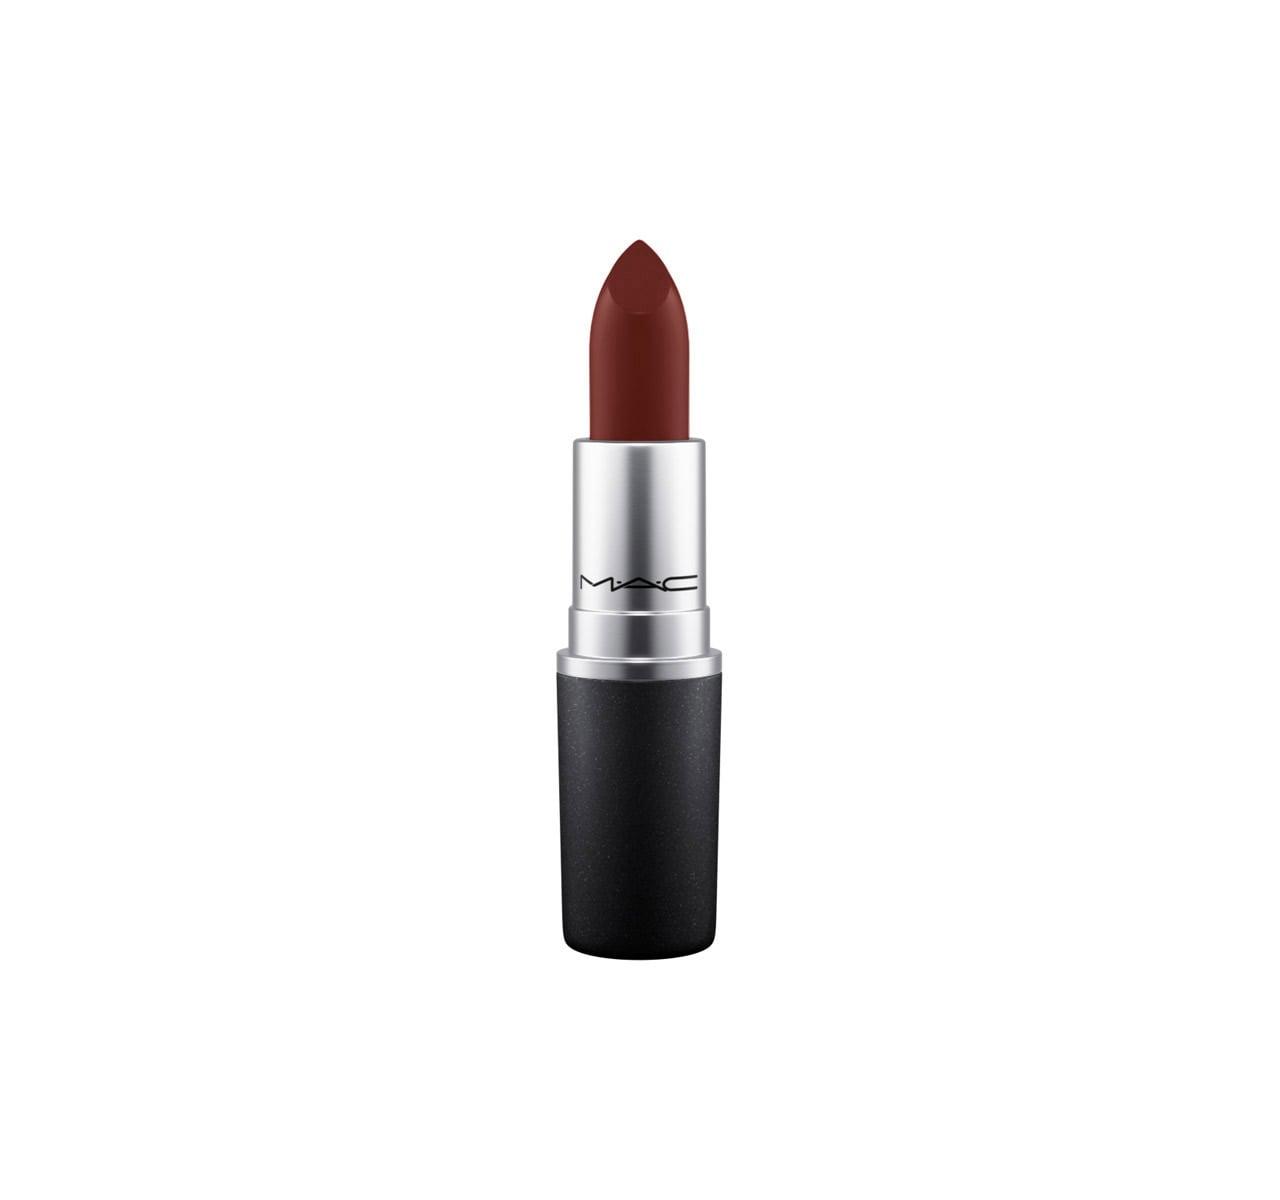 lipstick mac germany e commerce site. Black Bedroom Furniture Sets. Home Design Ideas